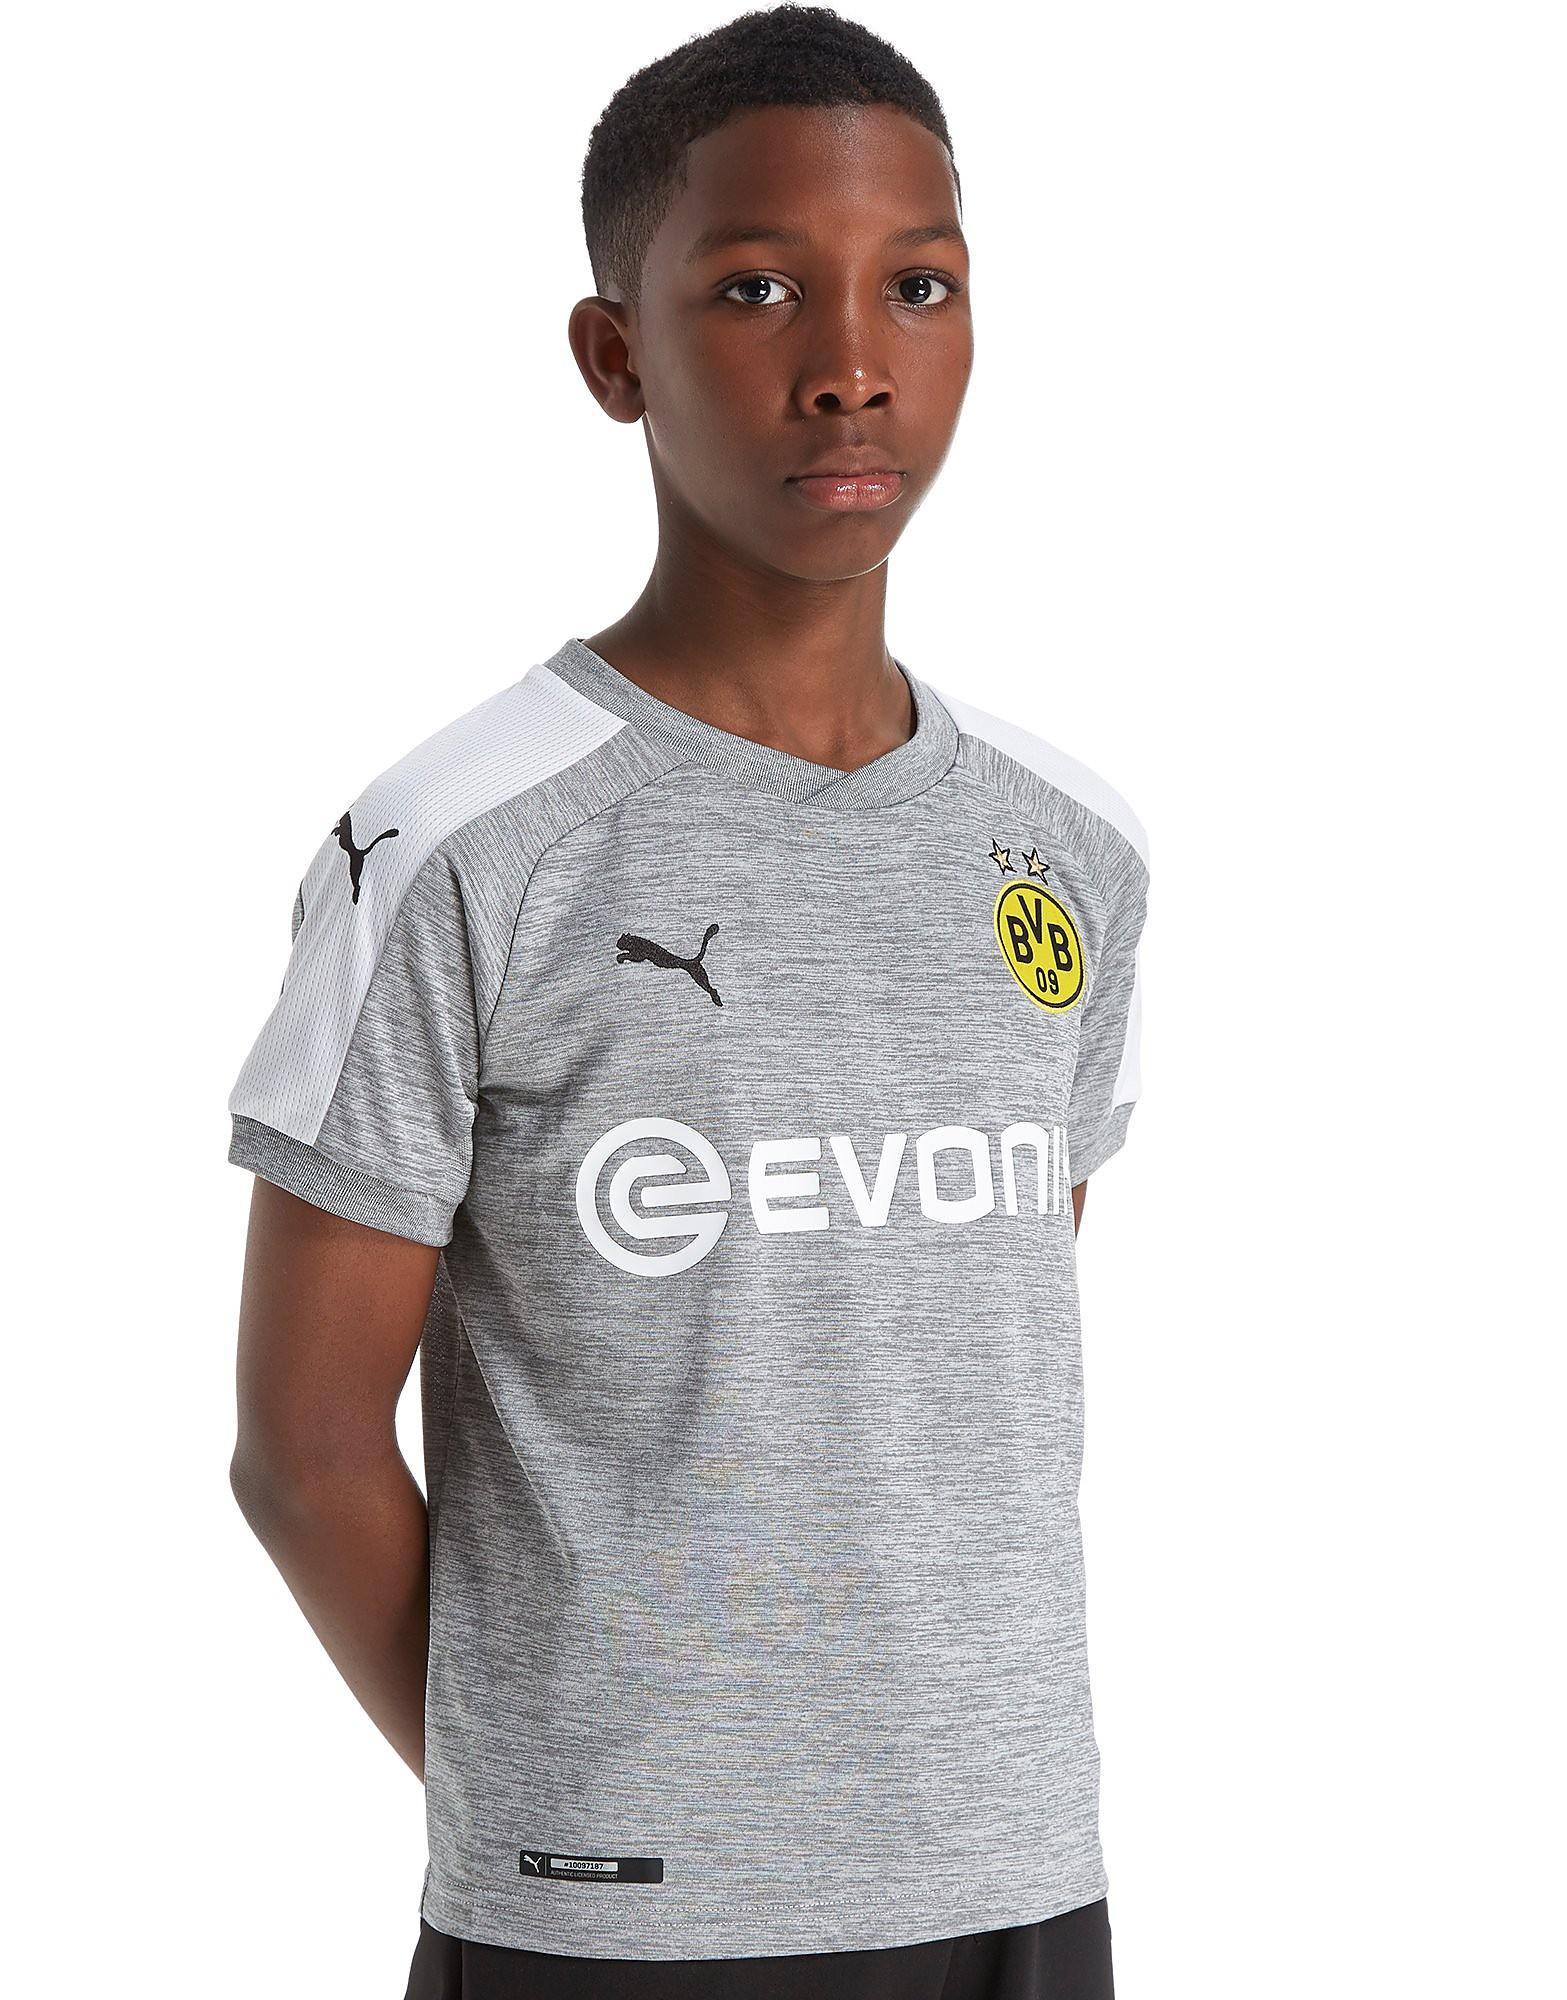 PUMA Borussia Dortmund 2017/18 Drittes Hemd Kinder